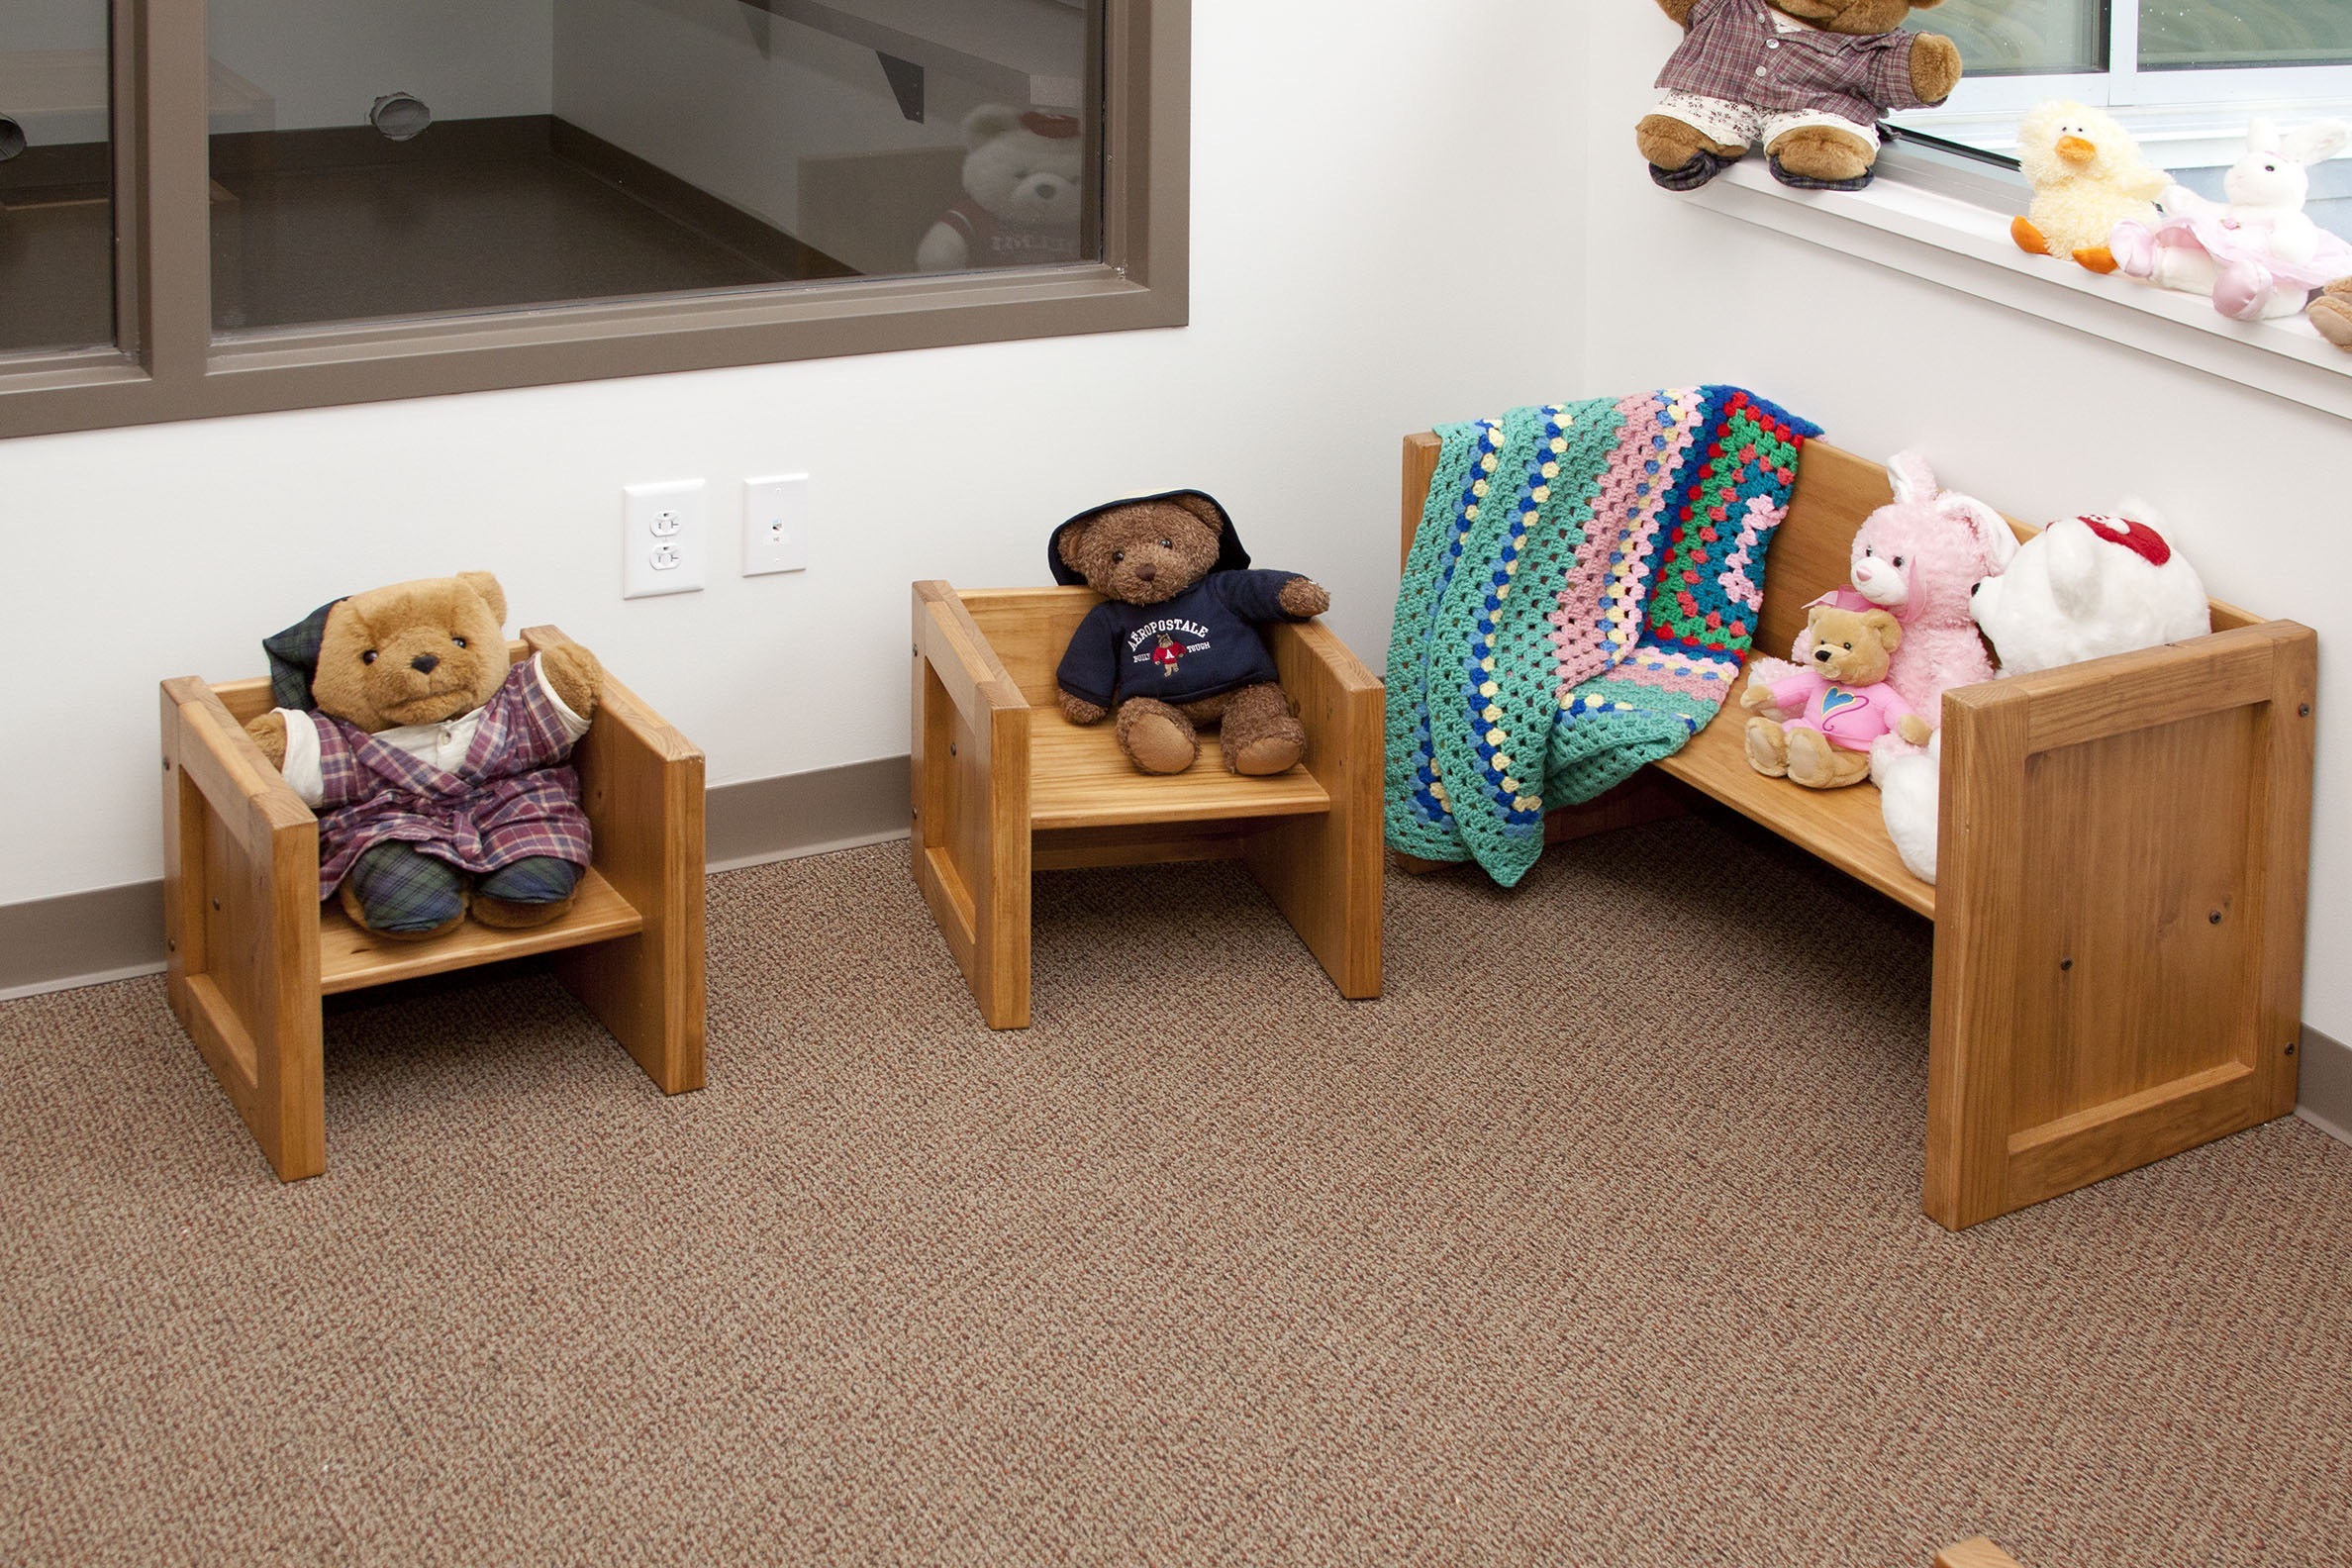 Children's crate style furniture